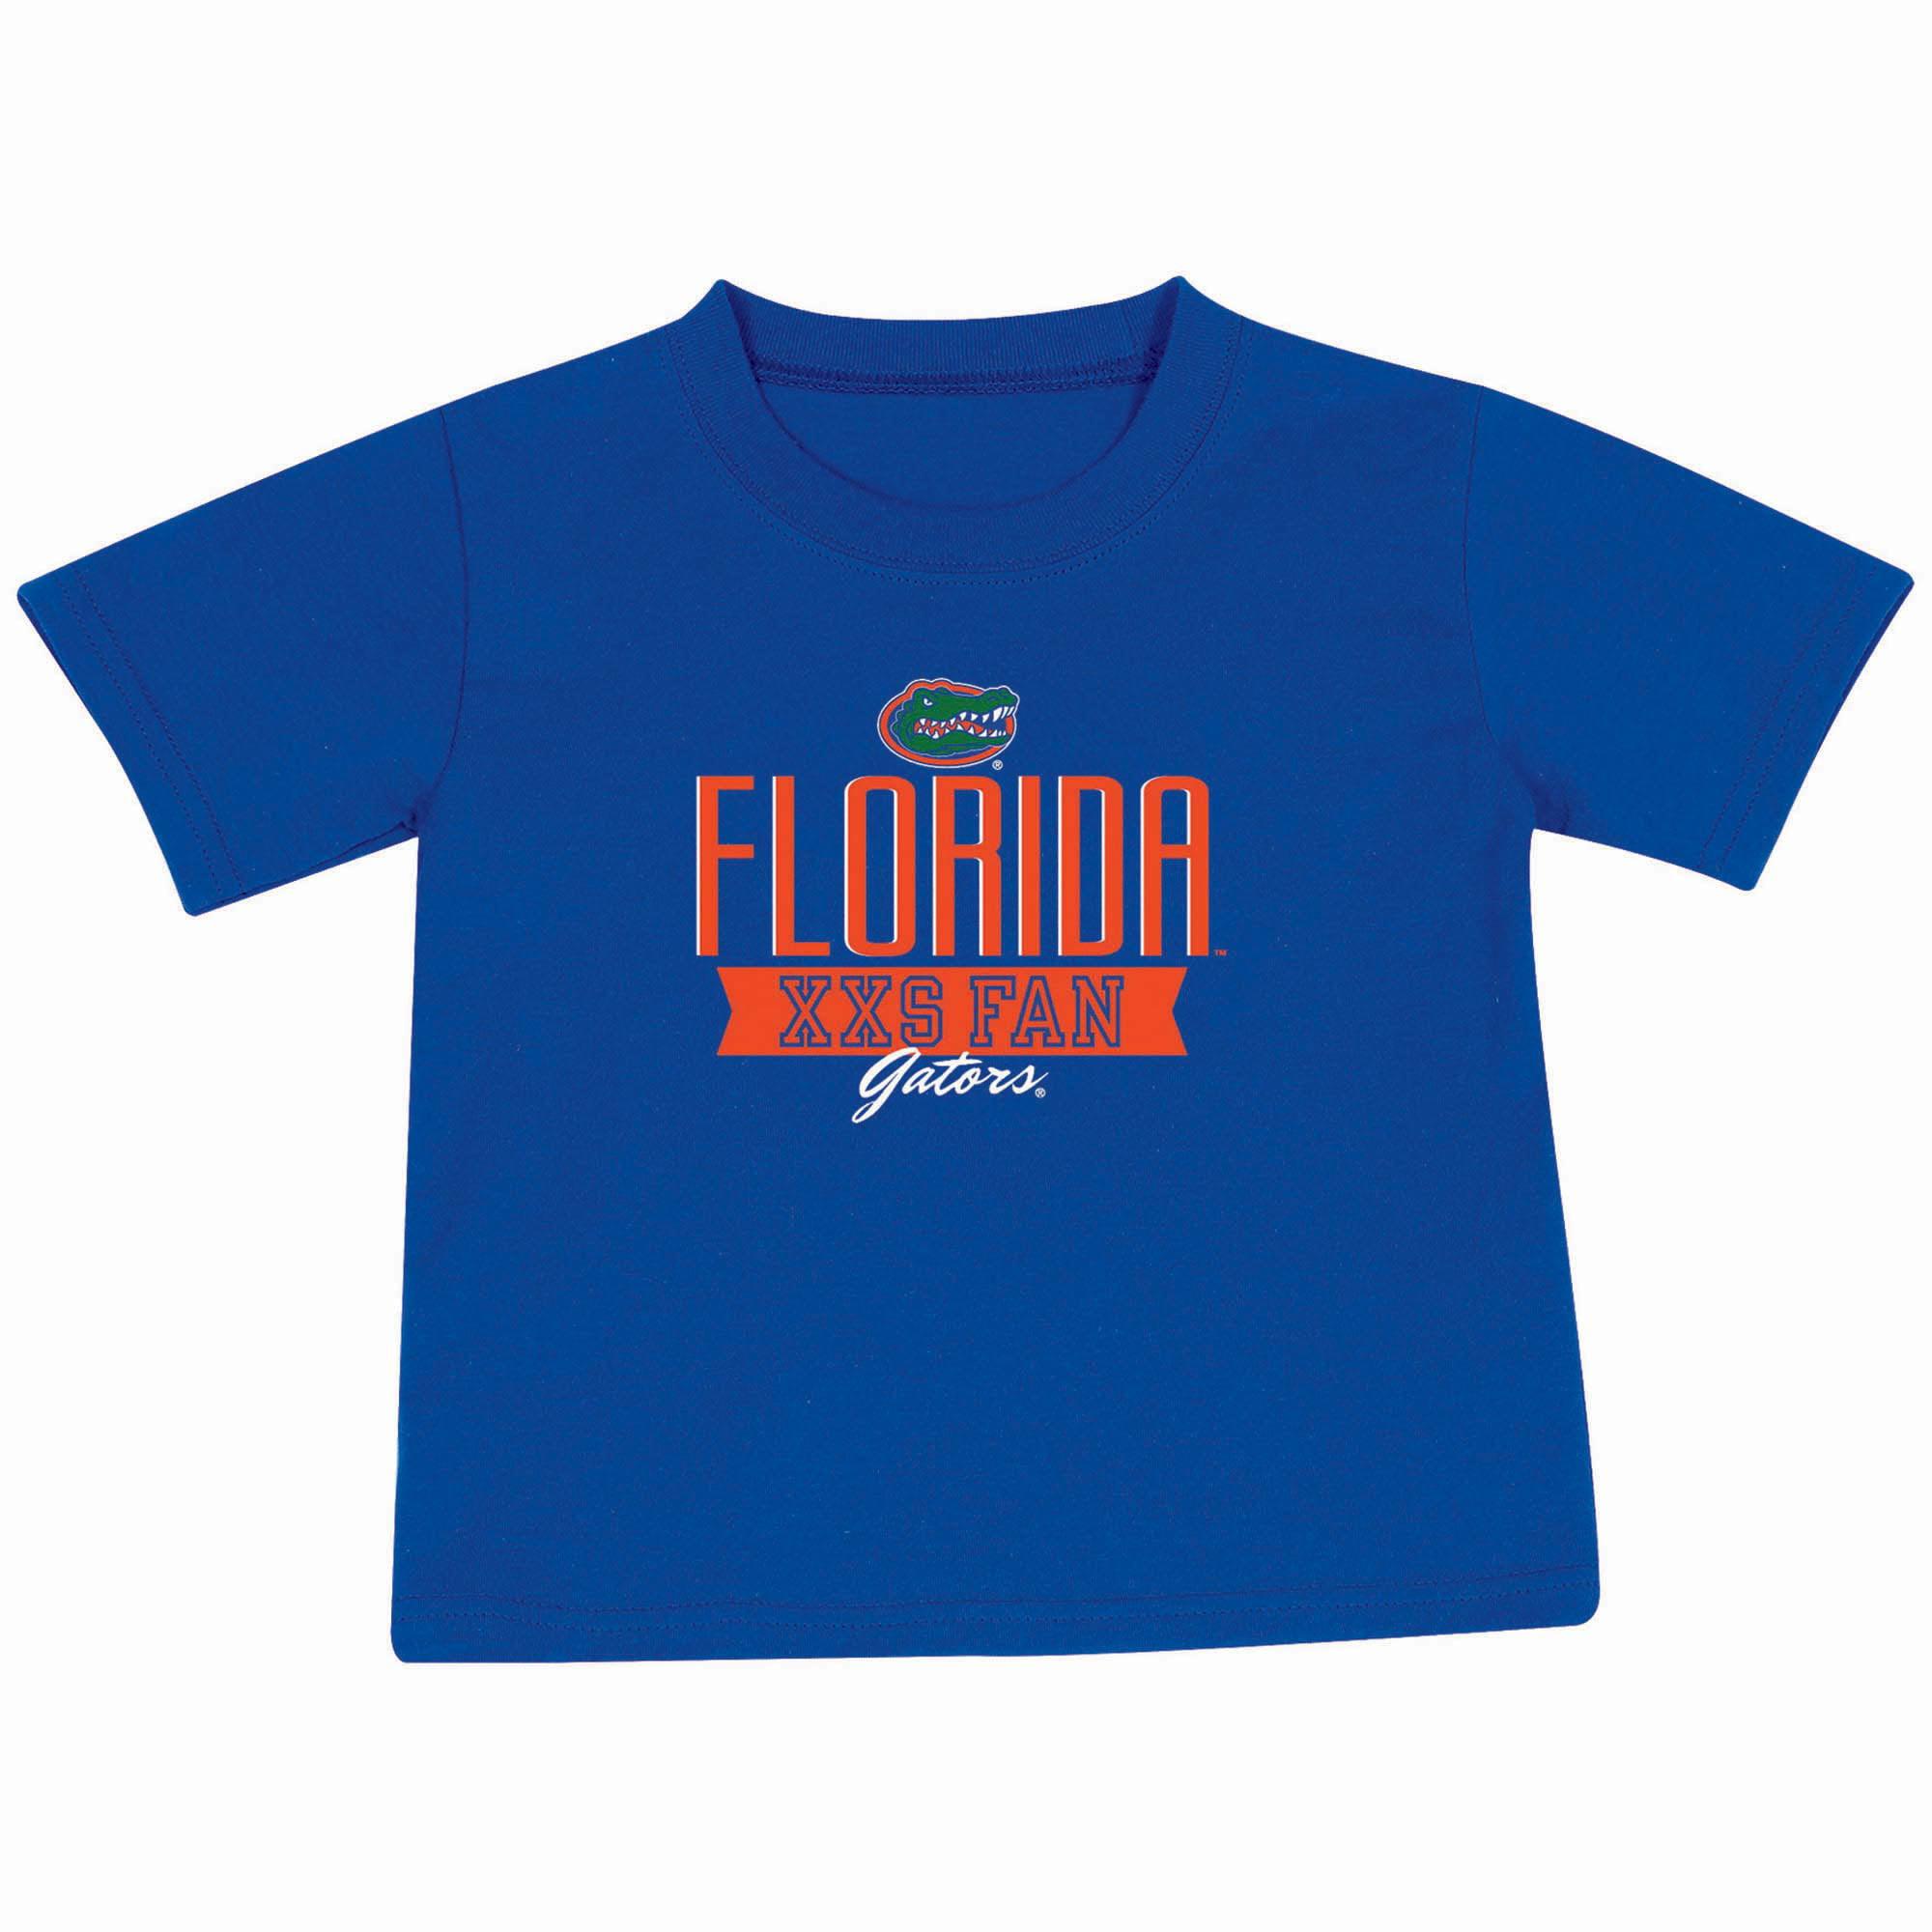 Toddler Russell Royal Florida Gators T-Shirt